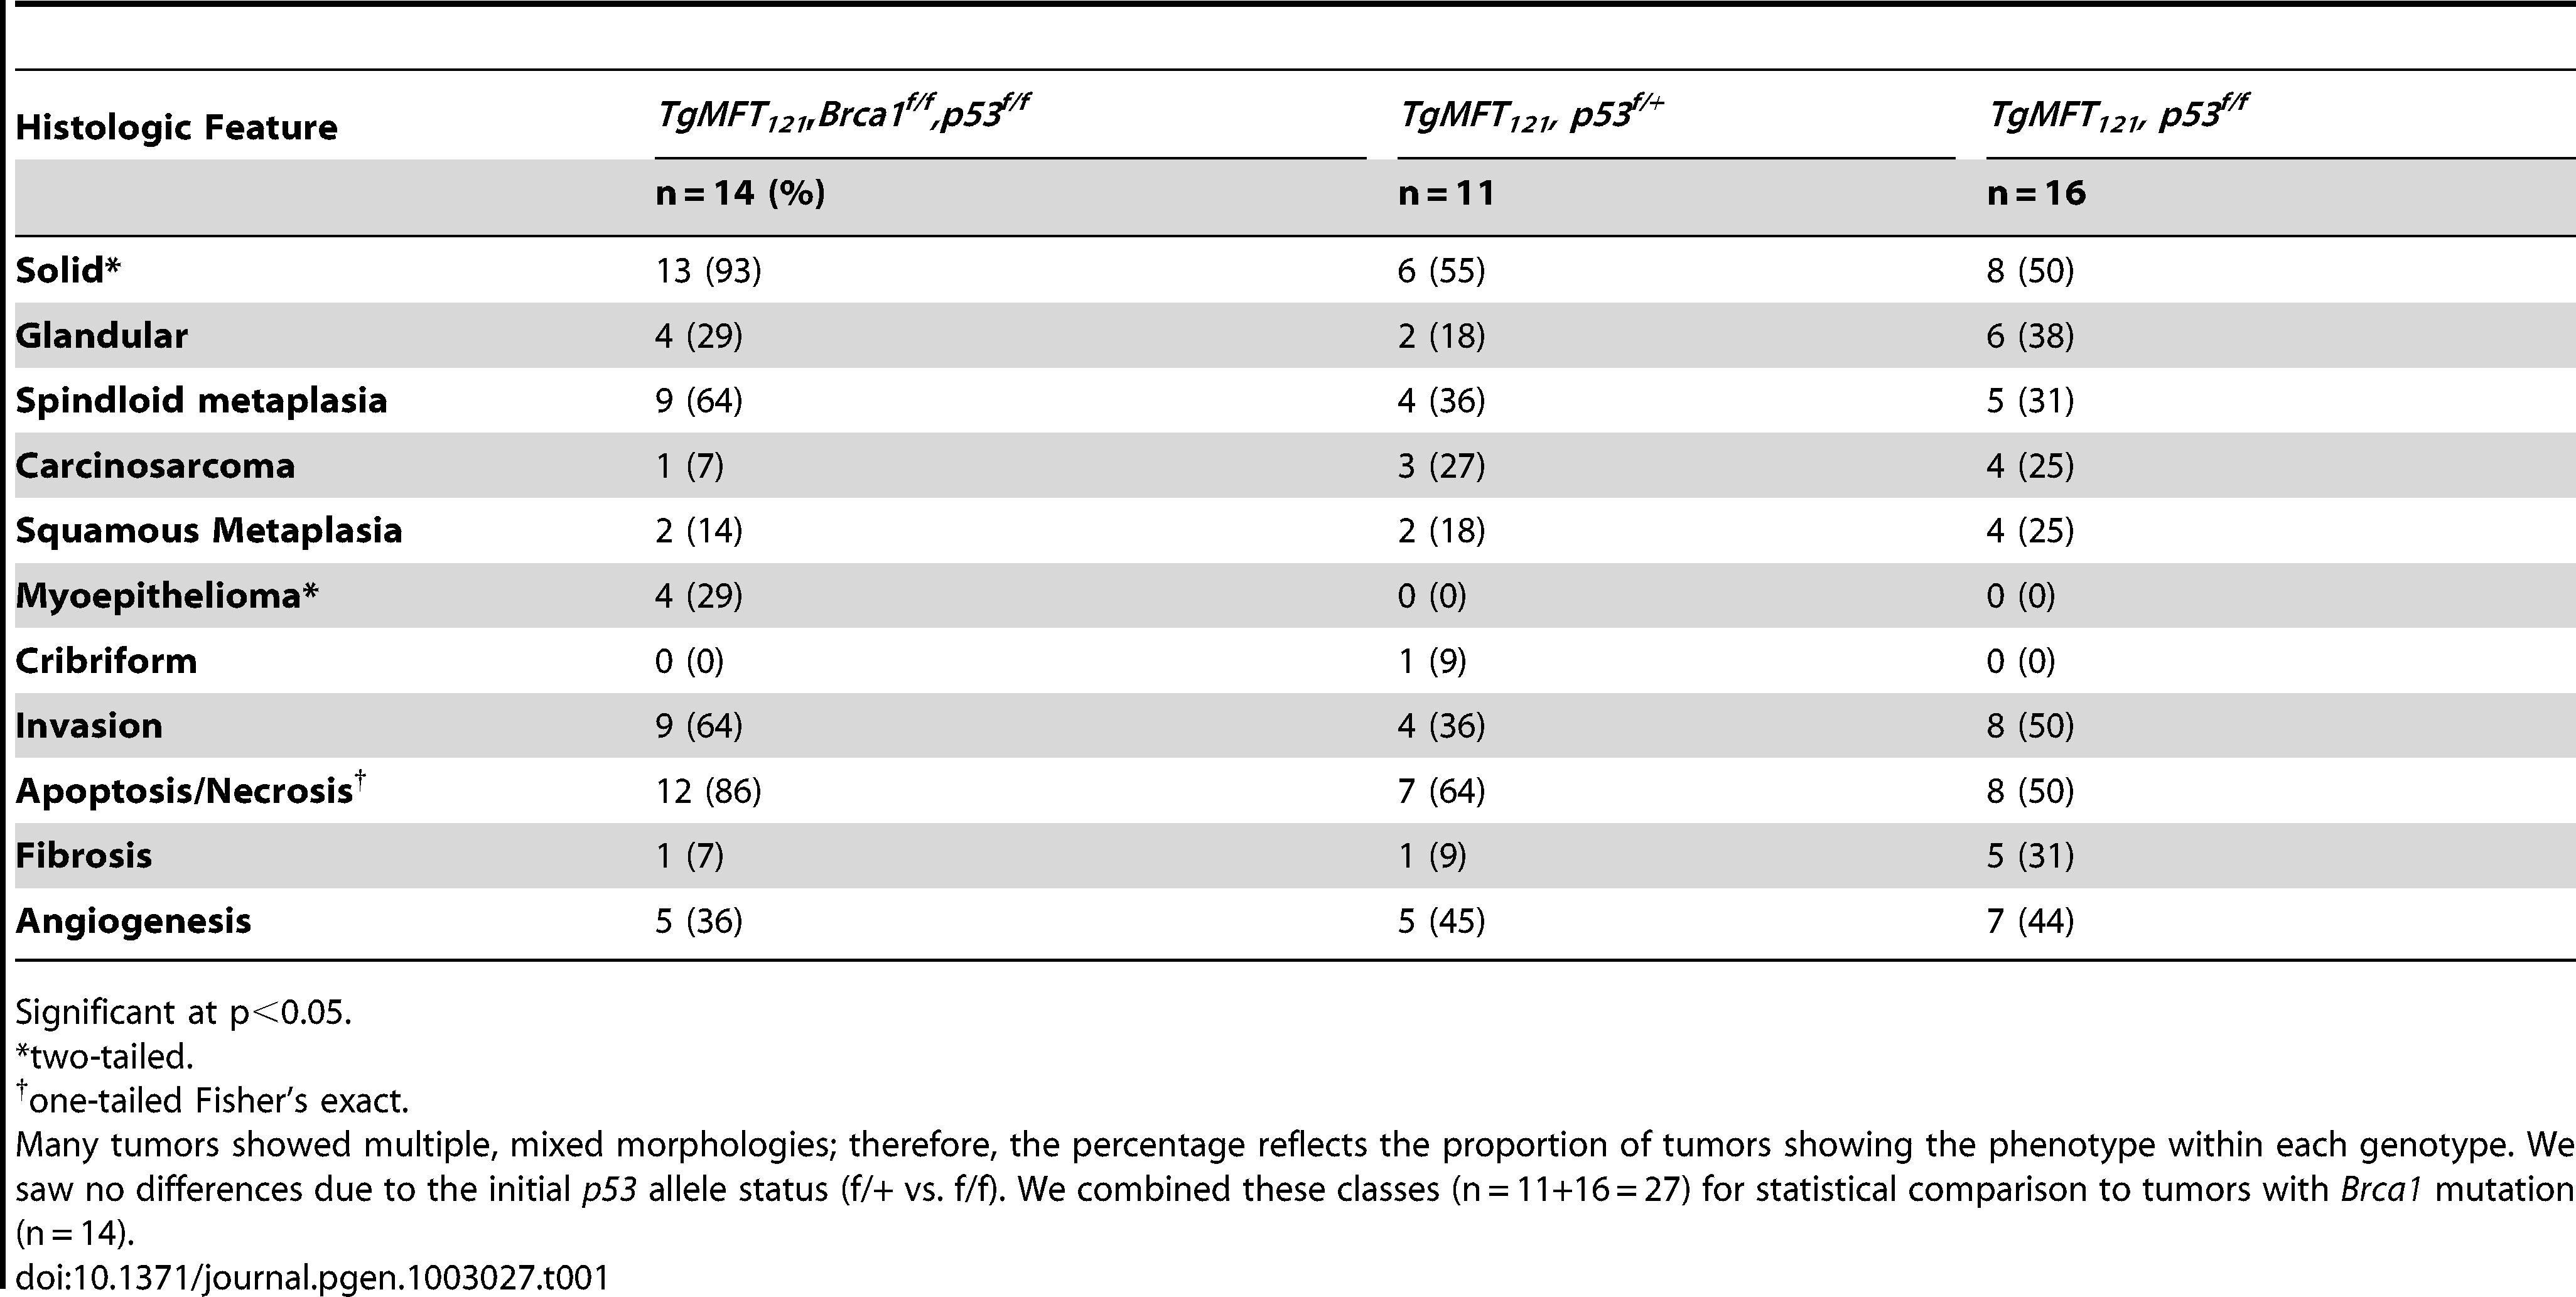 Characteristics of TP and TBP tumors.